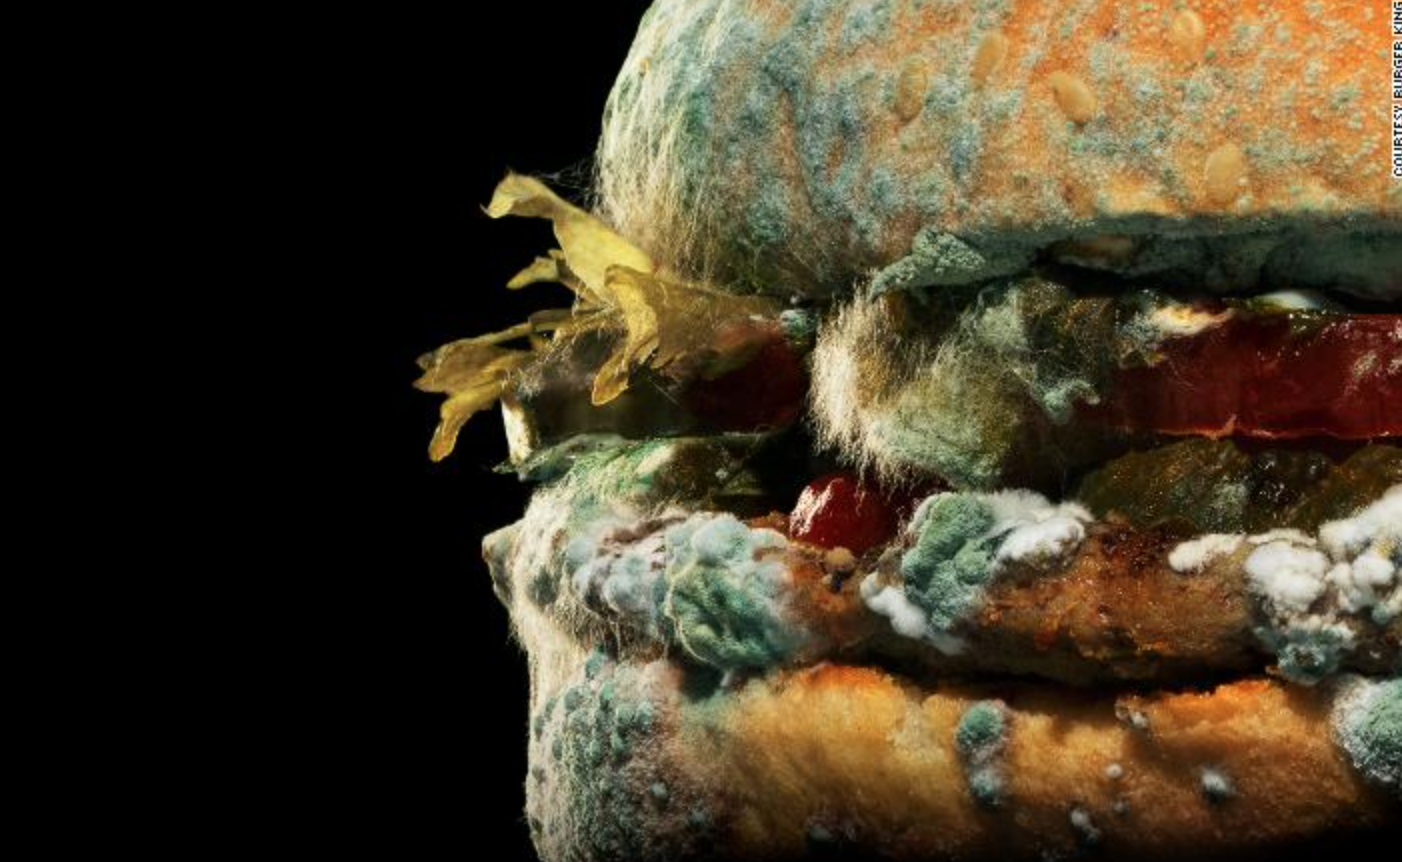 Burger King auglýsir rotnandi hamborgara